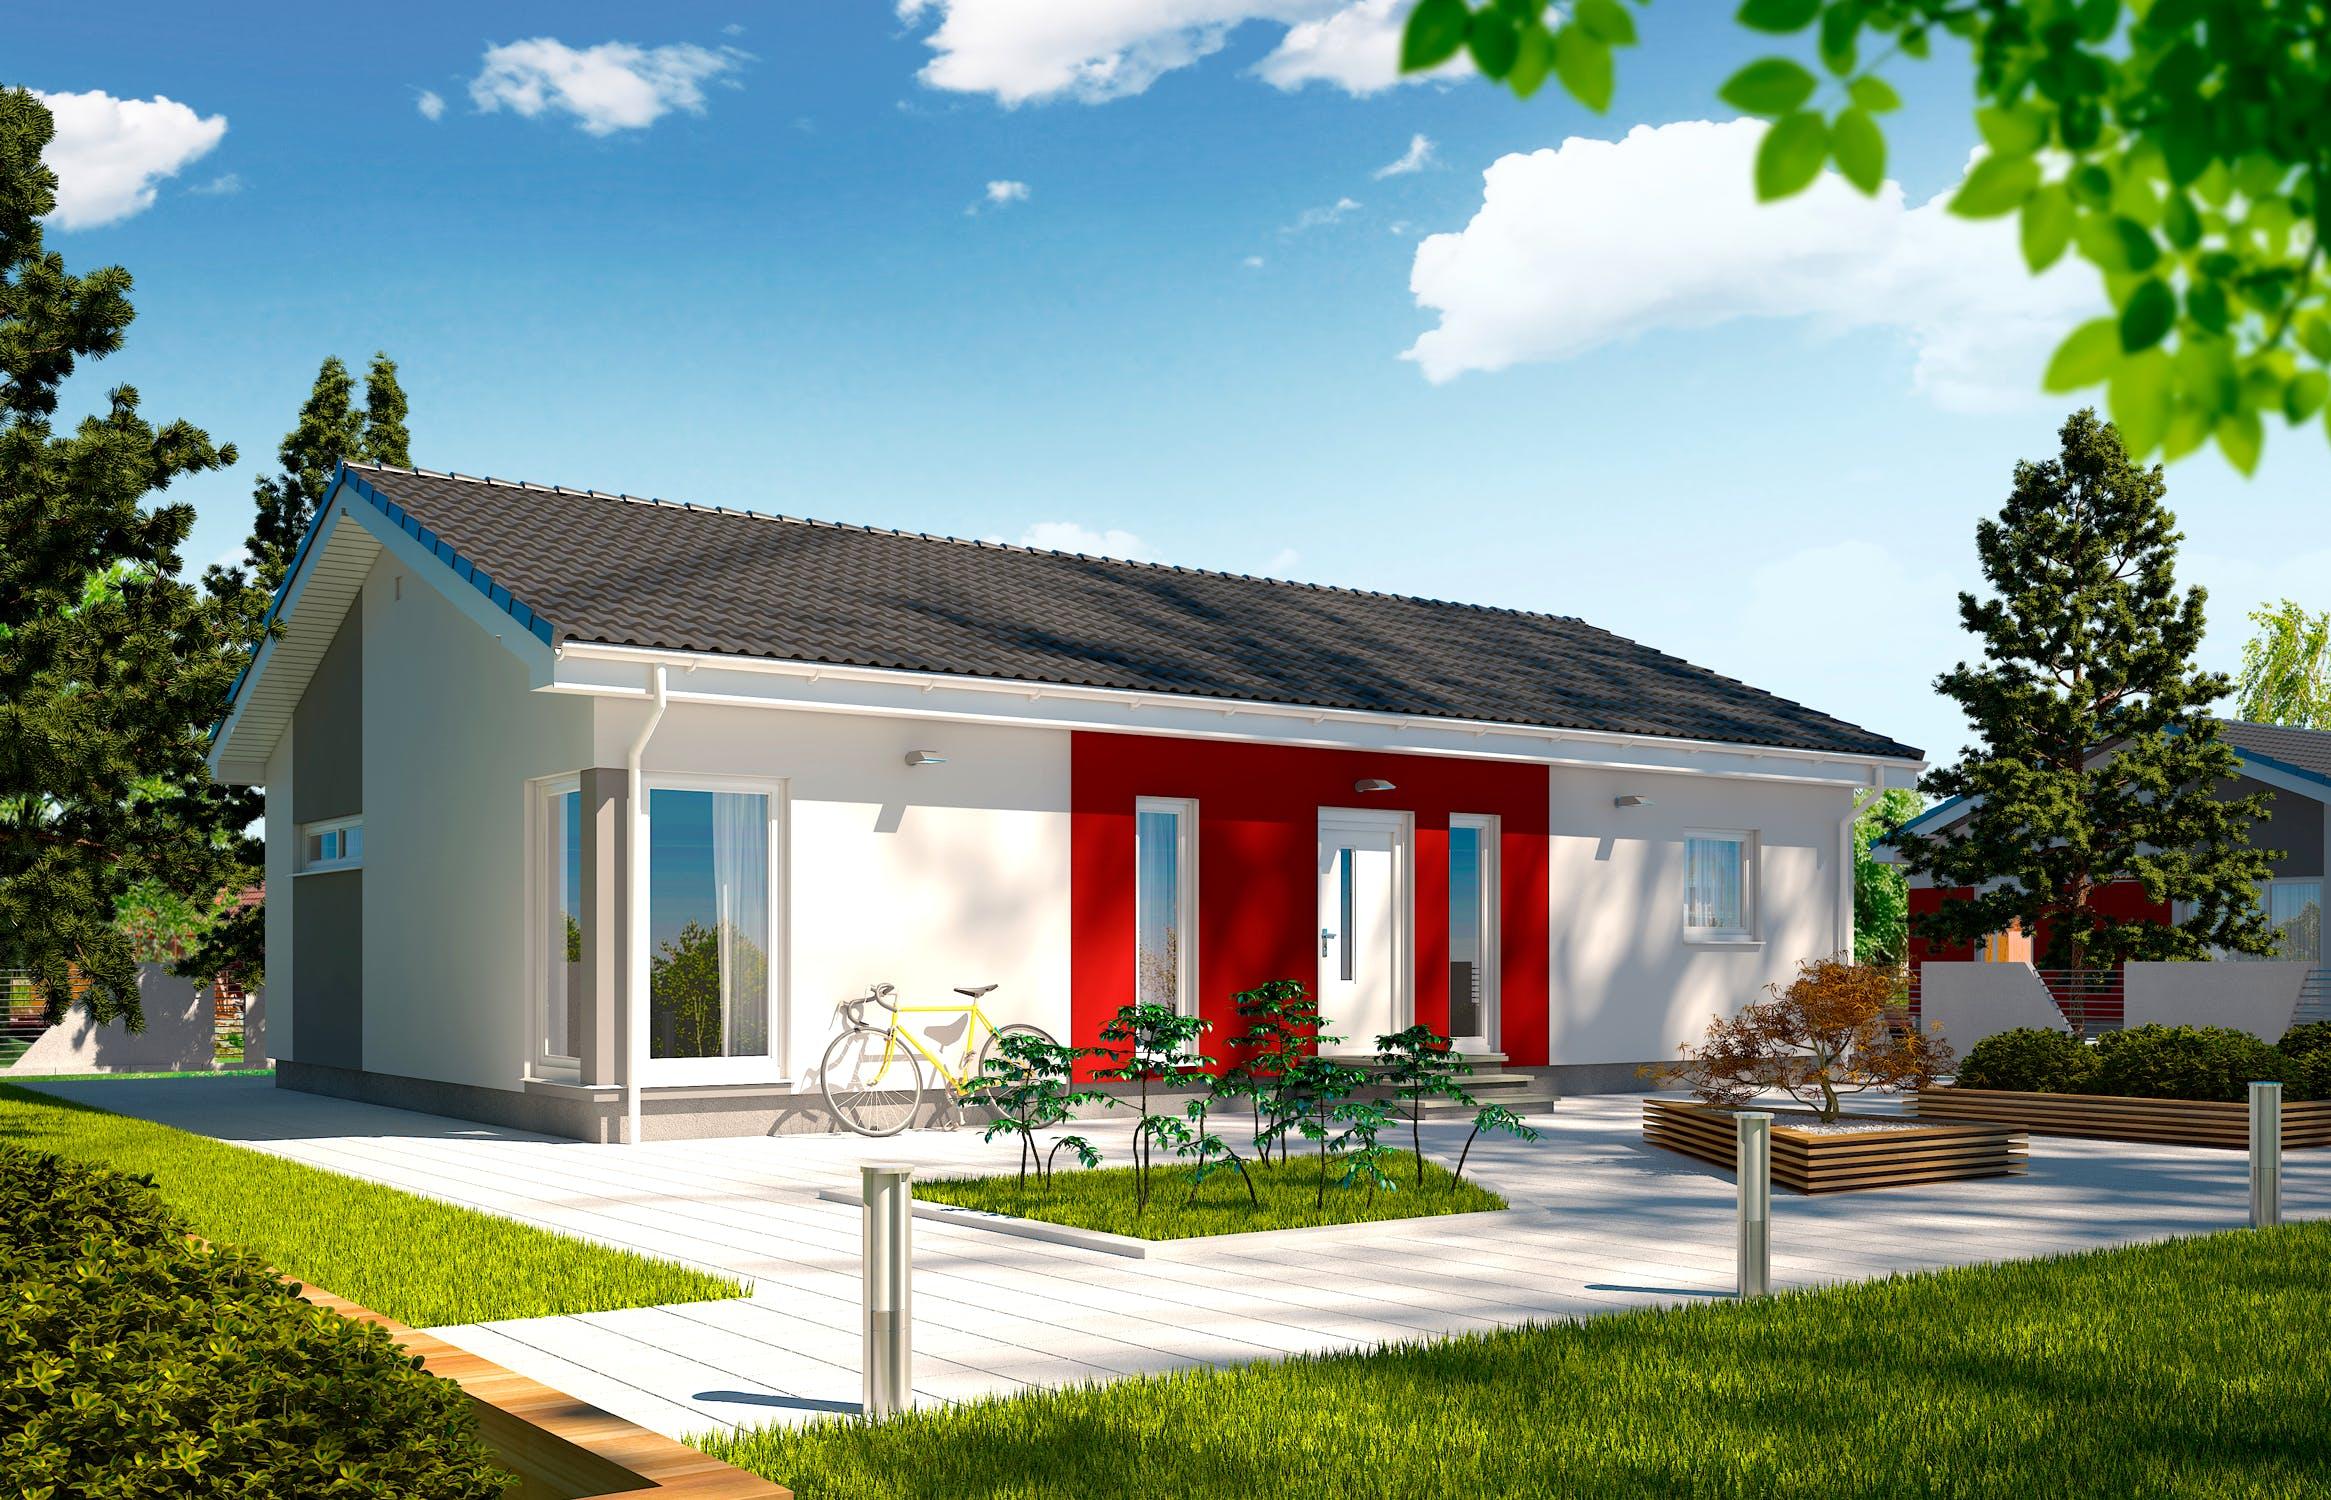 Fertighaus bungalow preise schlüsselfertig  Schlüsselfertiges Fertighaus bis 150.000€ - Häuser | Preise | Anbieter